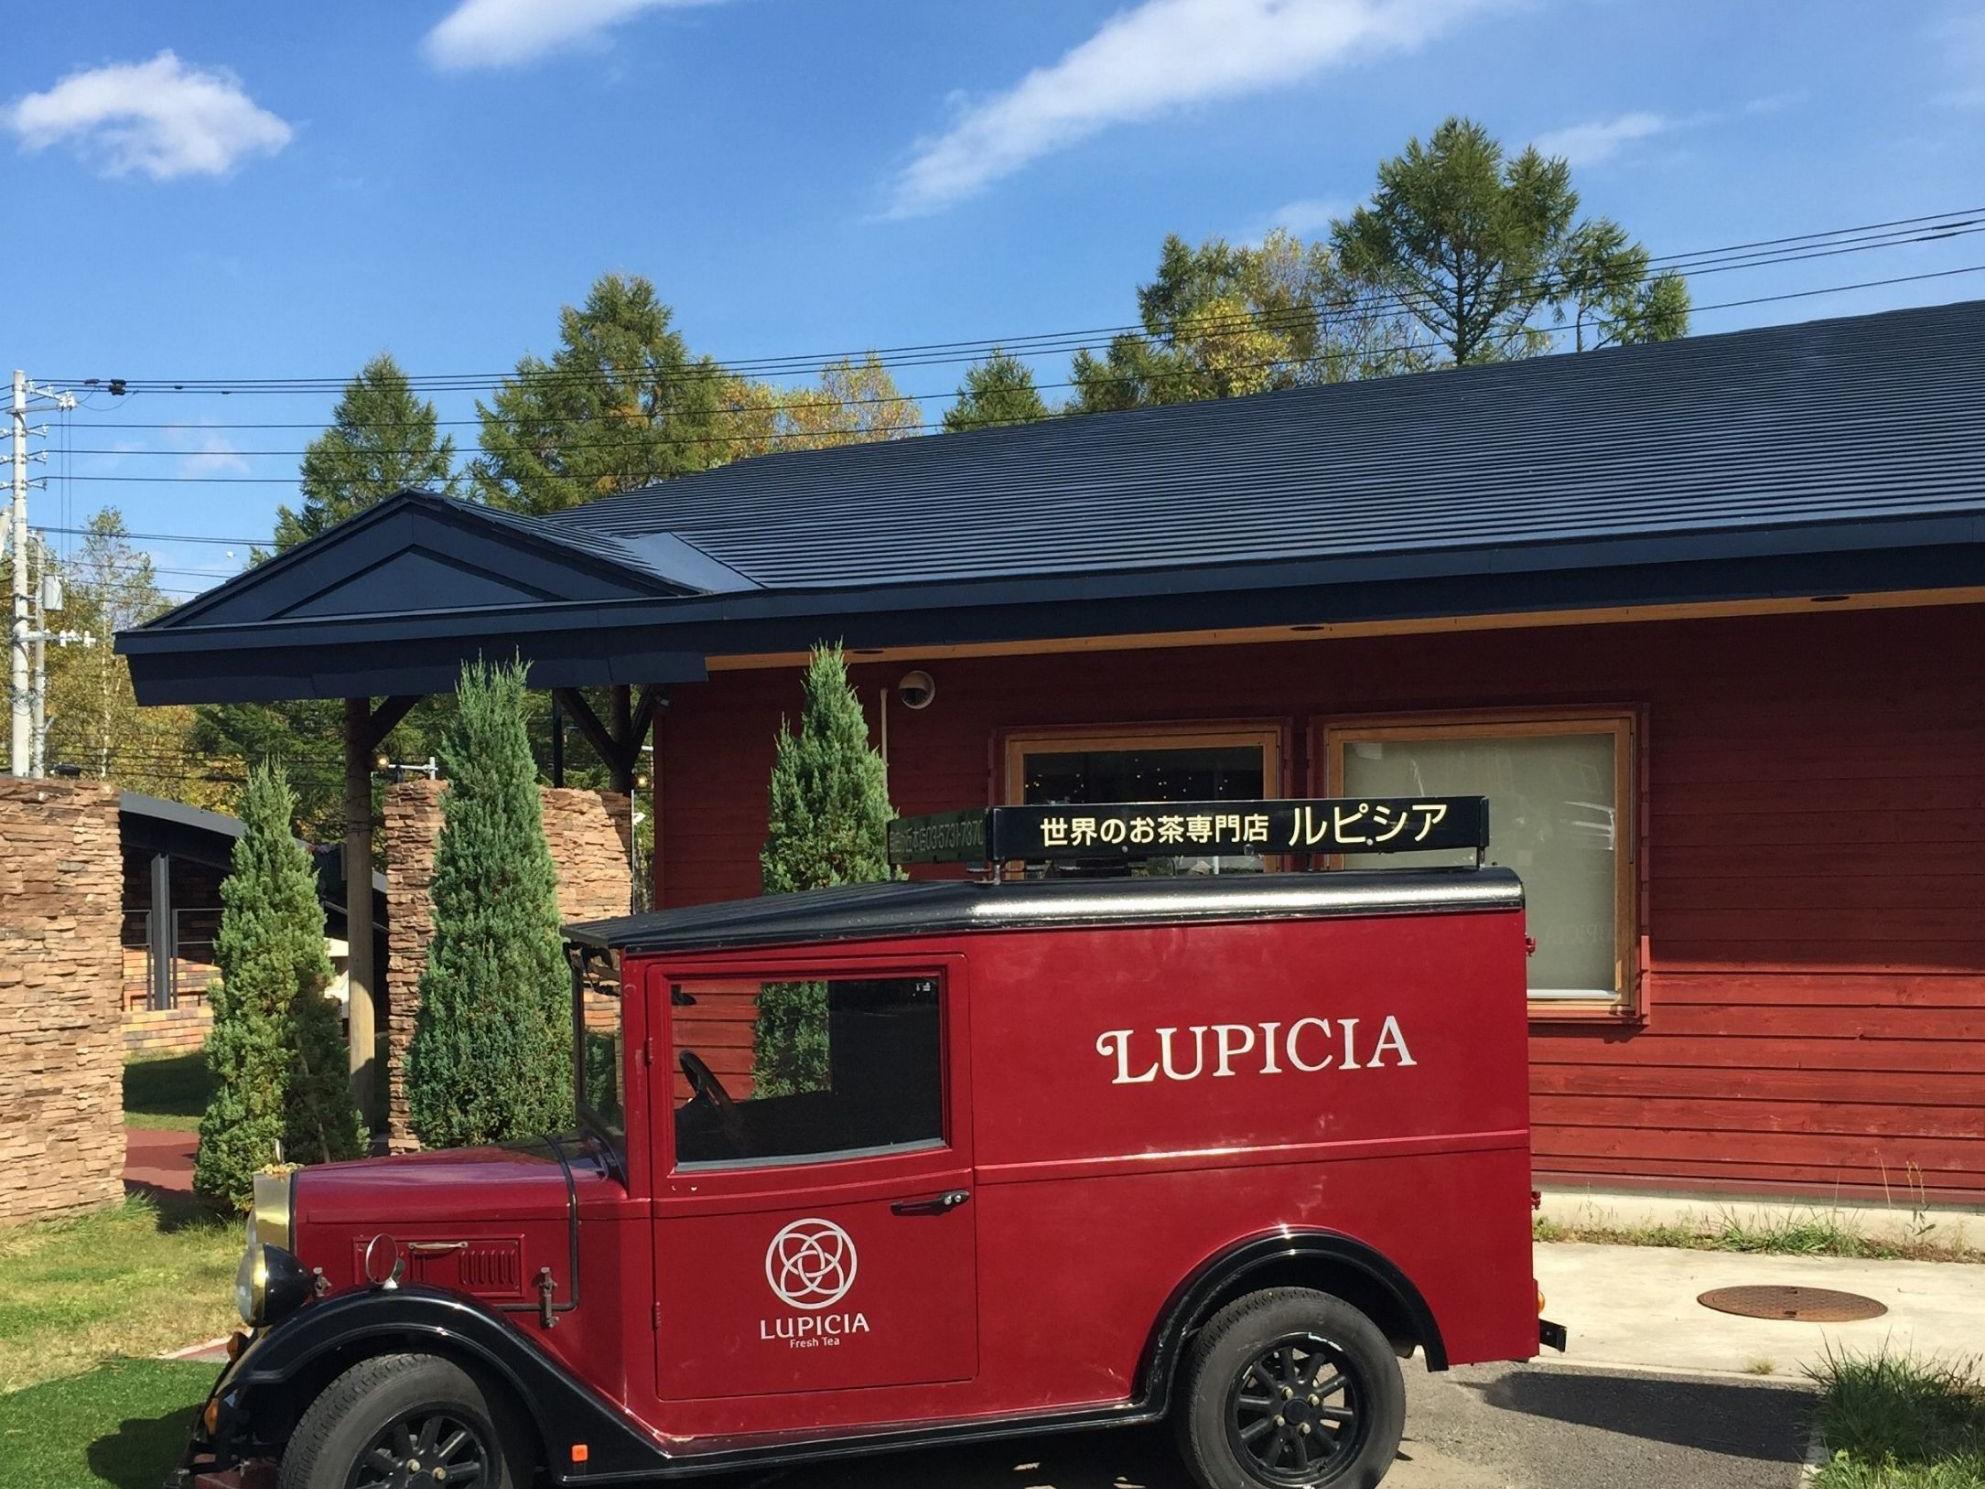 An old car in front of Lupicia Restaurant at La Villa Lupicia near Chatrium Niseko Japan